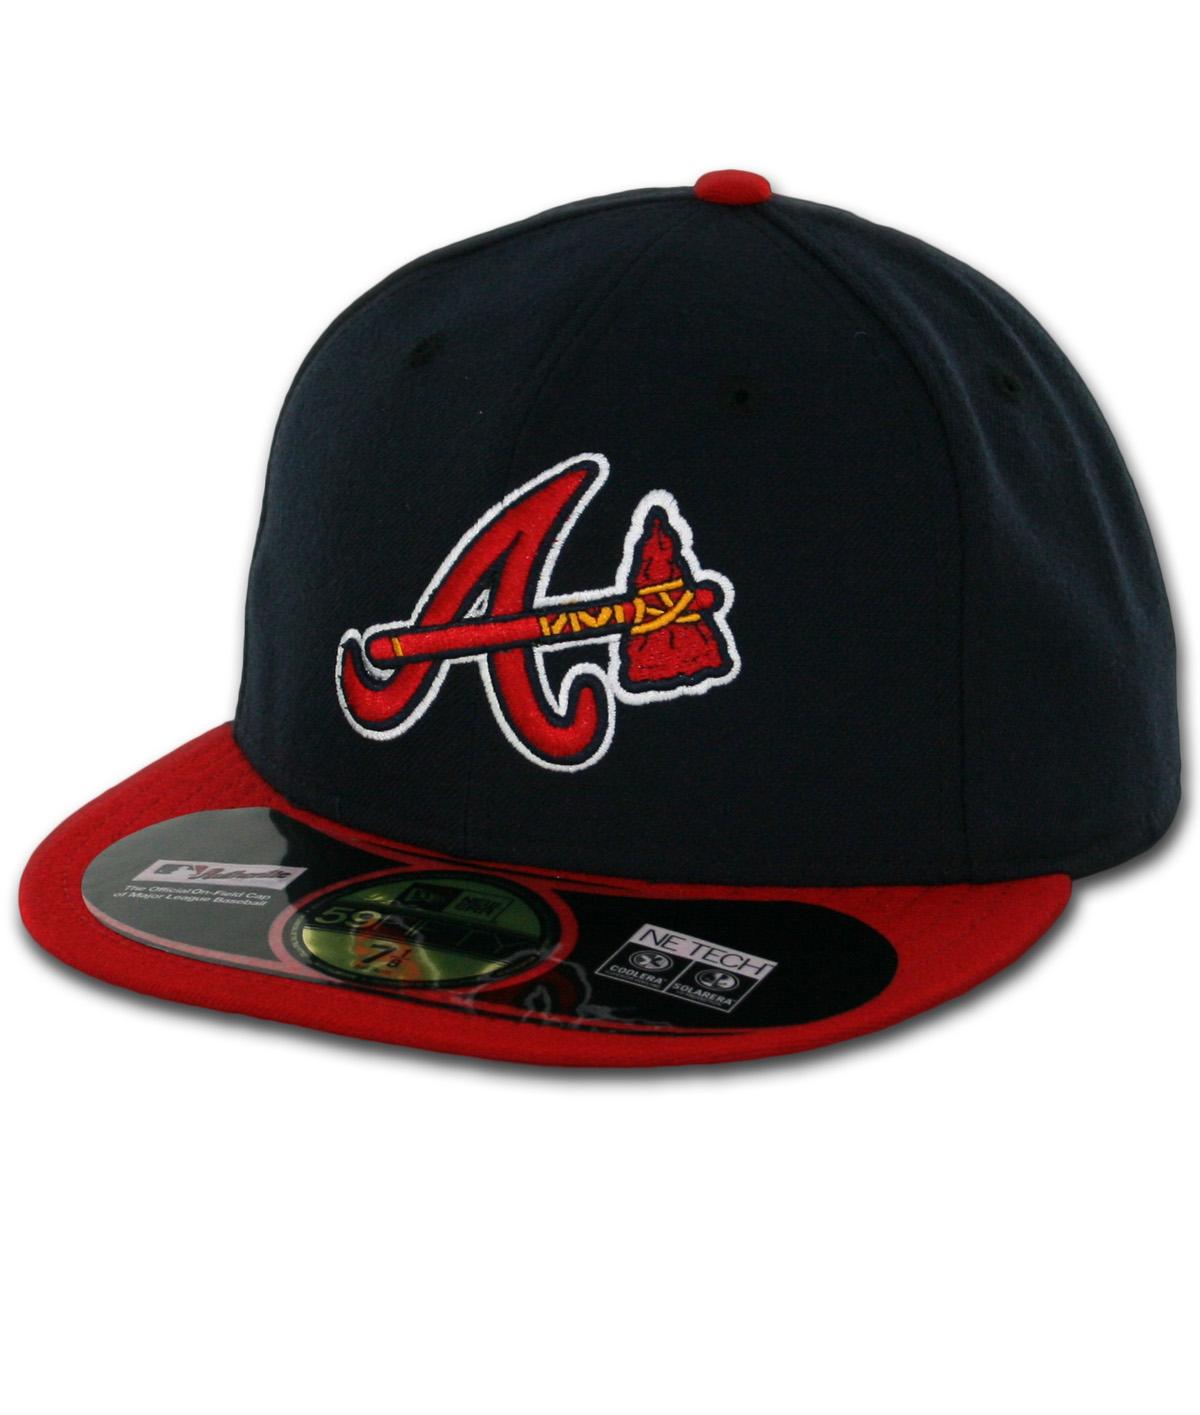 New Era 5950 Atlanta Braves Alternate Authentic On Field ...Atlanta Braves